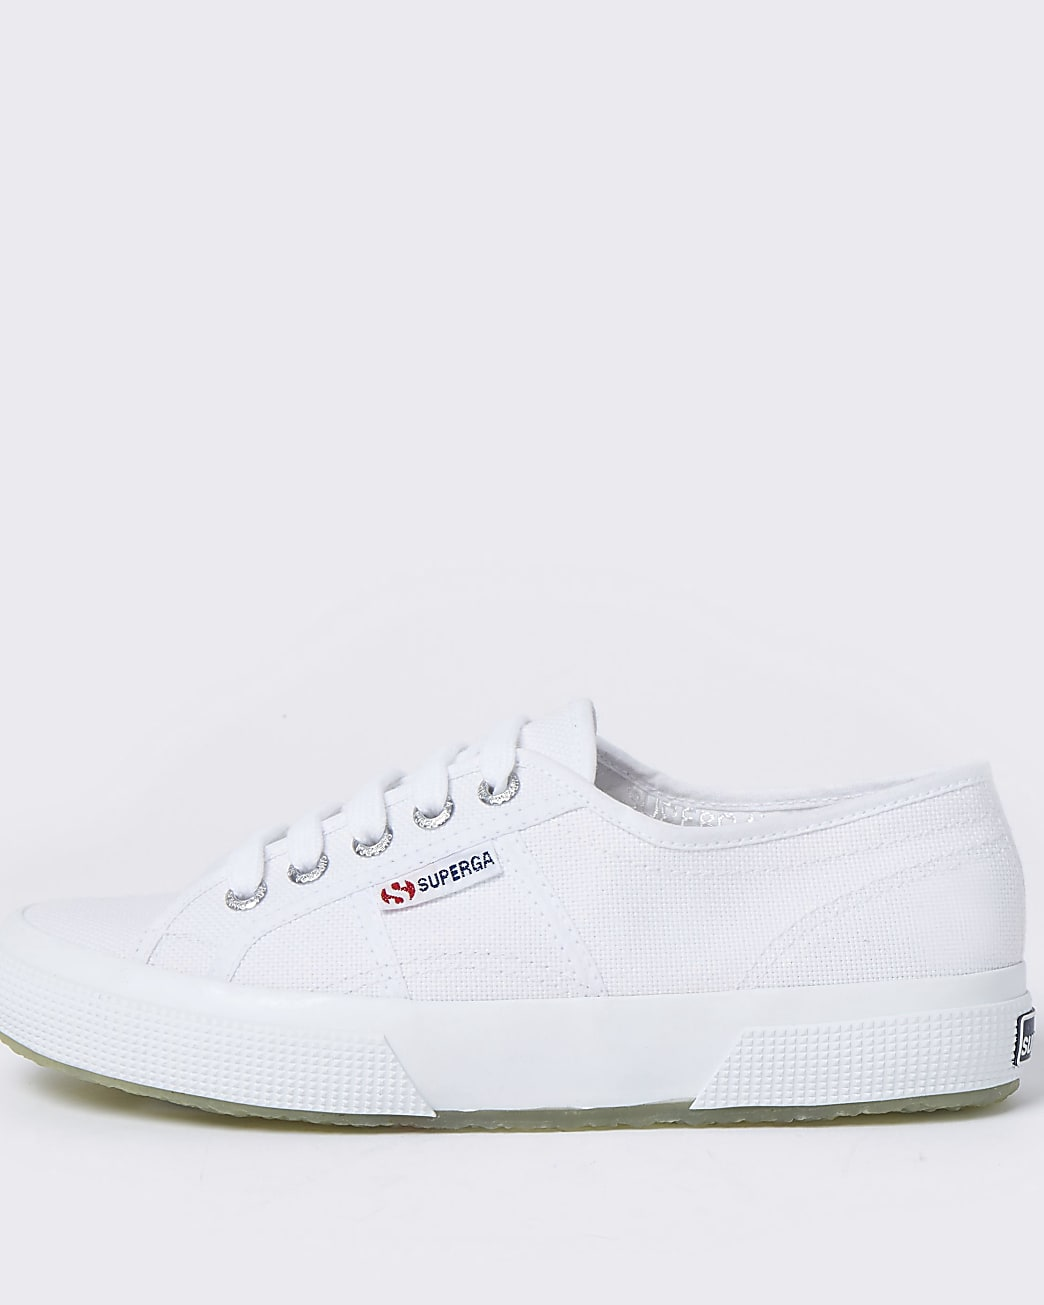 Superga white classic canvas trainers